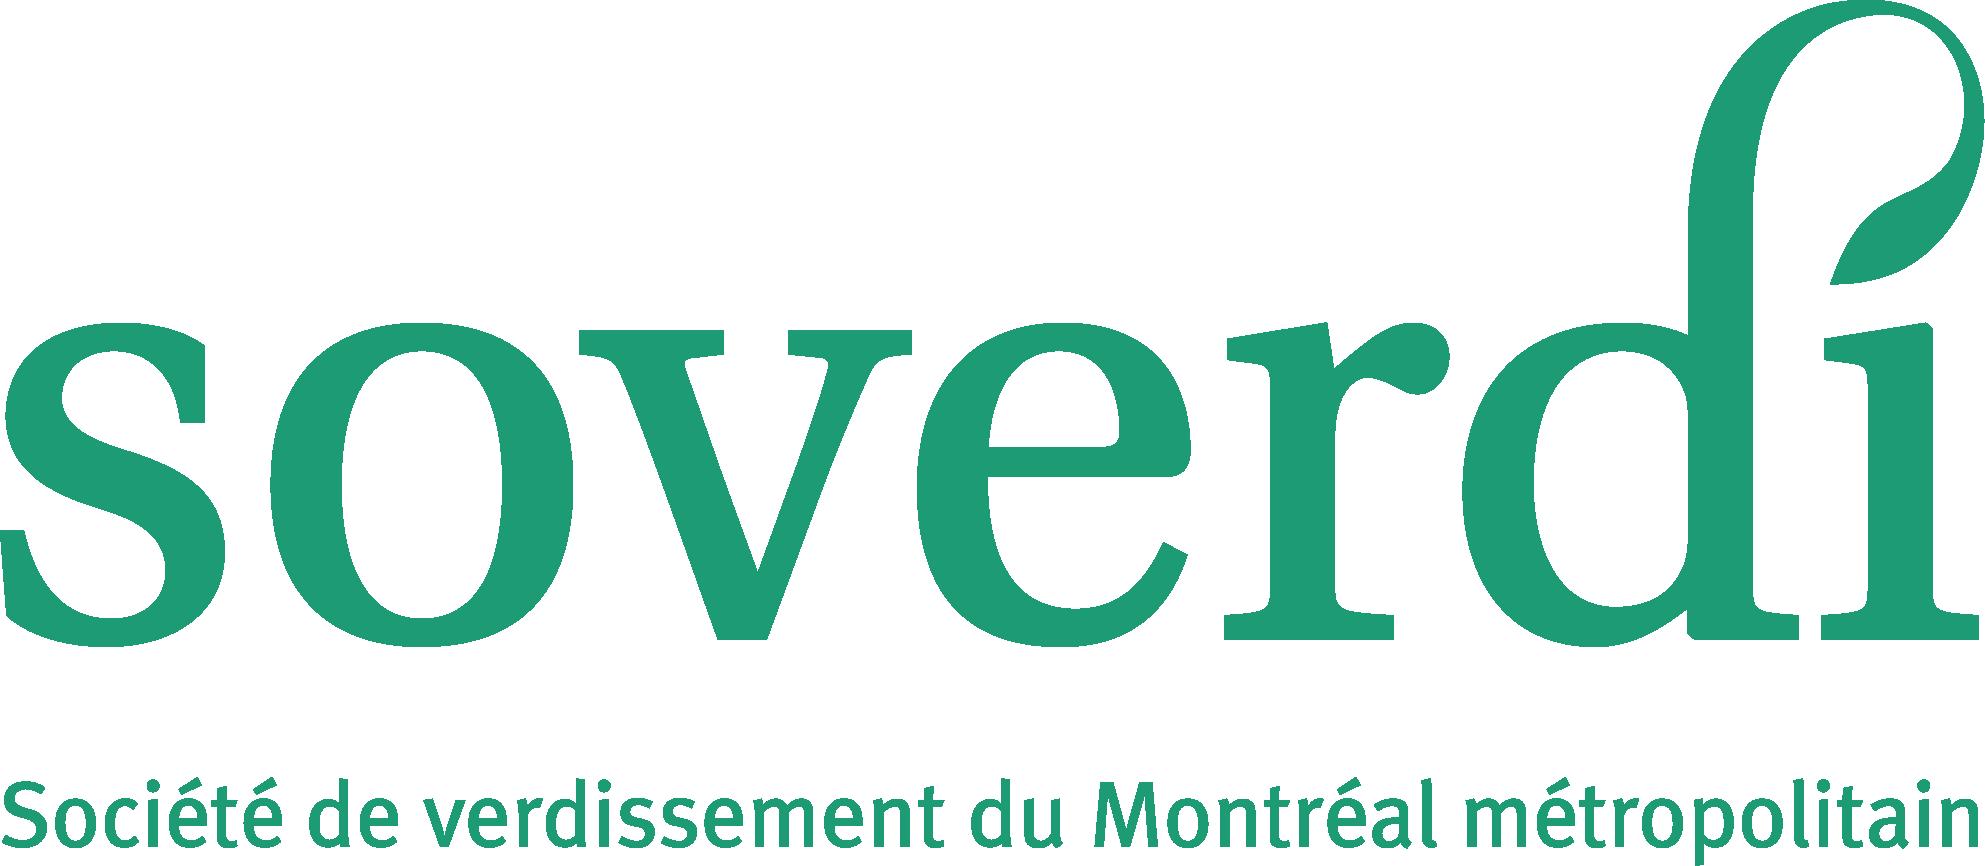 logo_soverdi-complet-vert_RGB.png